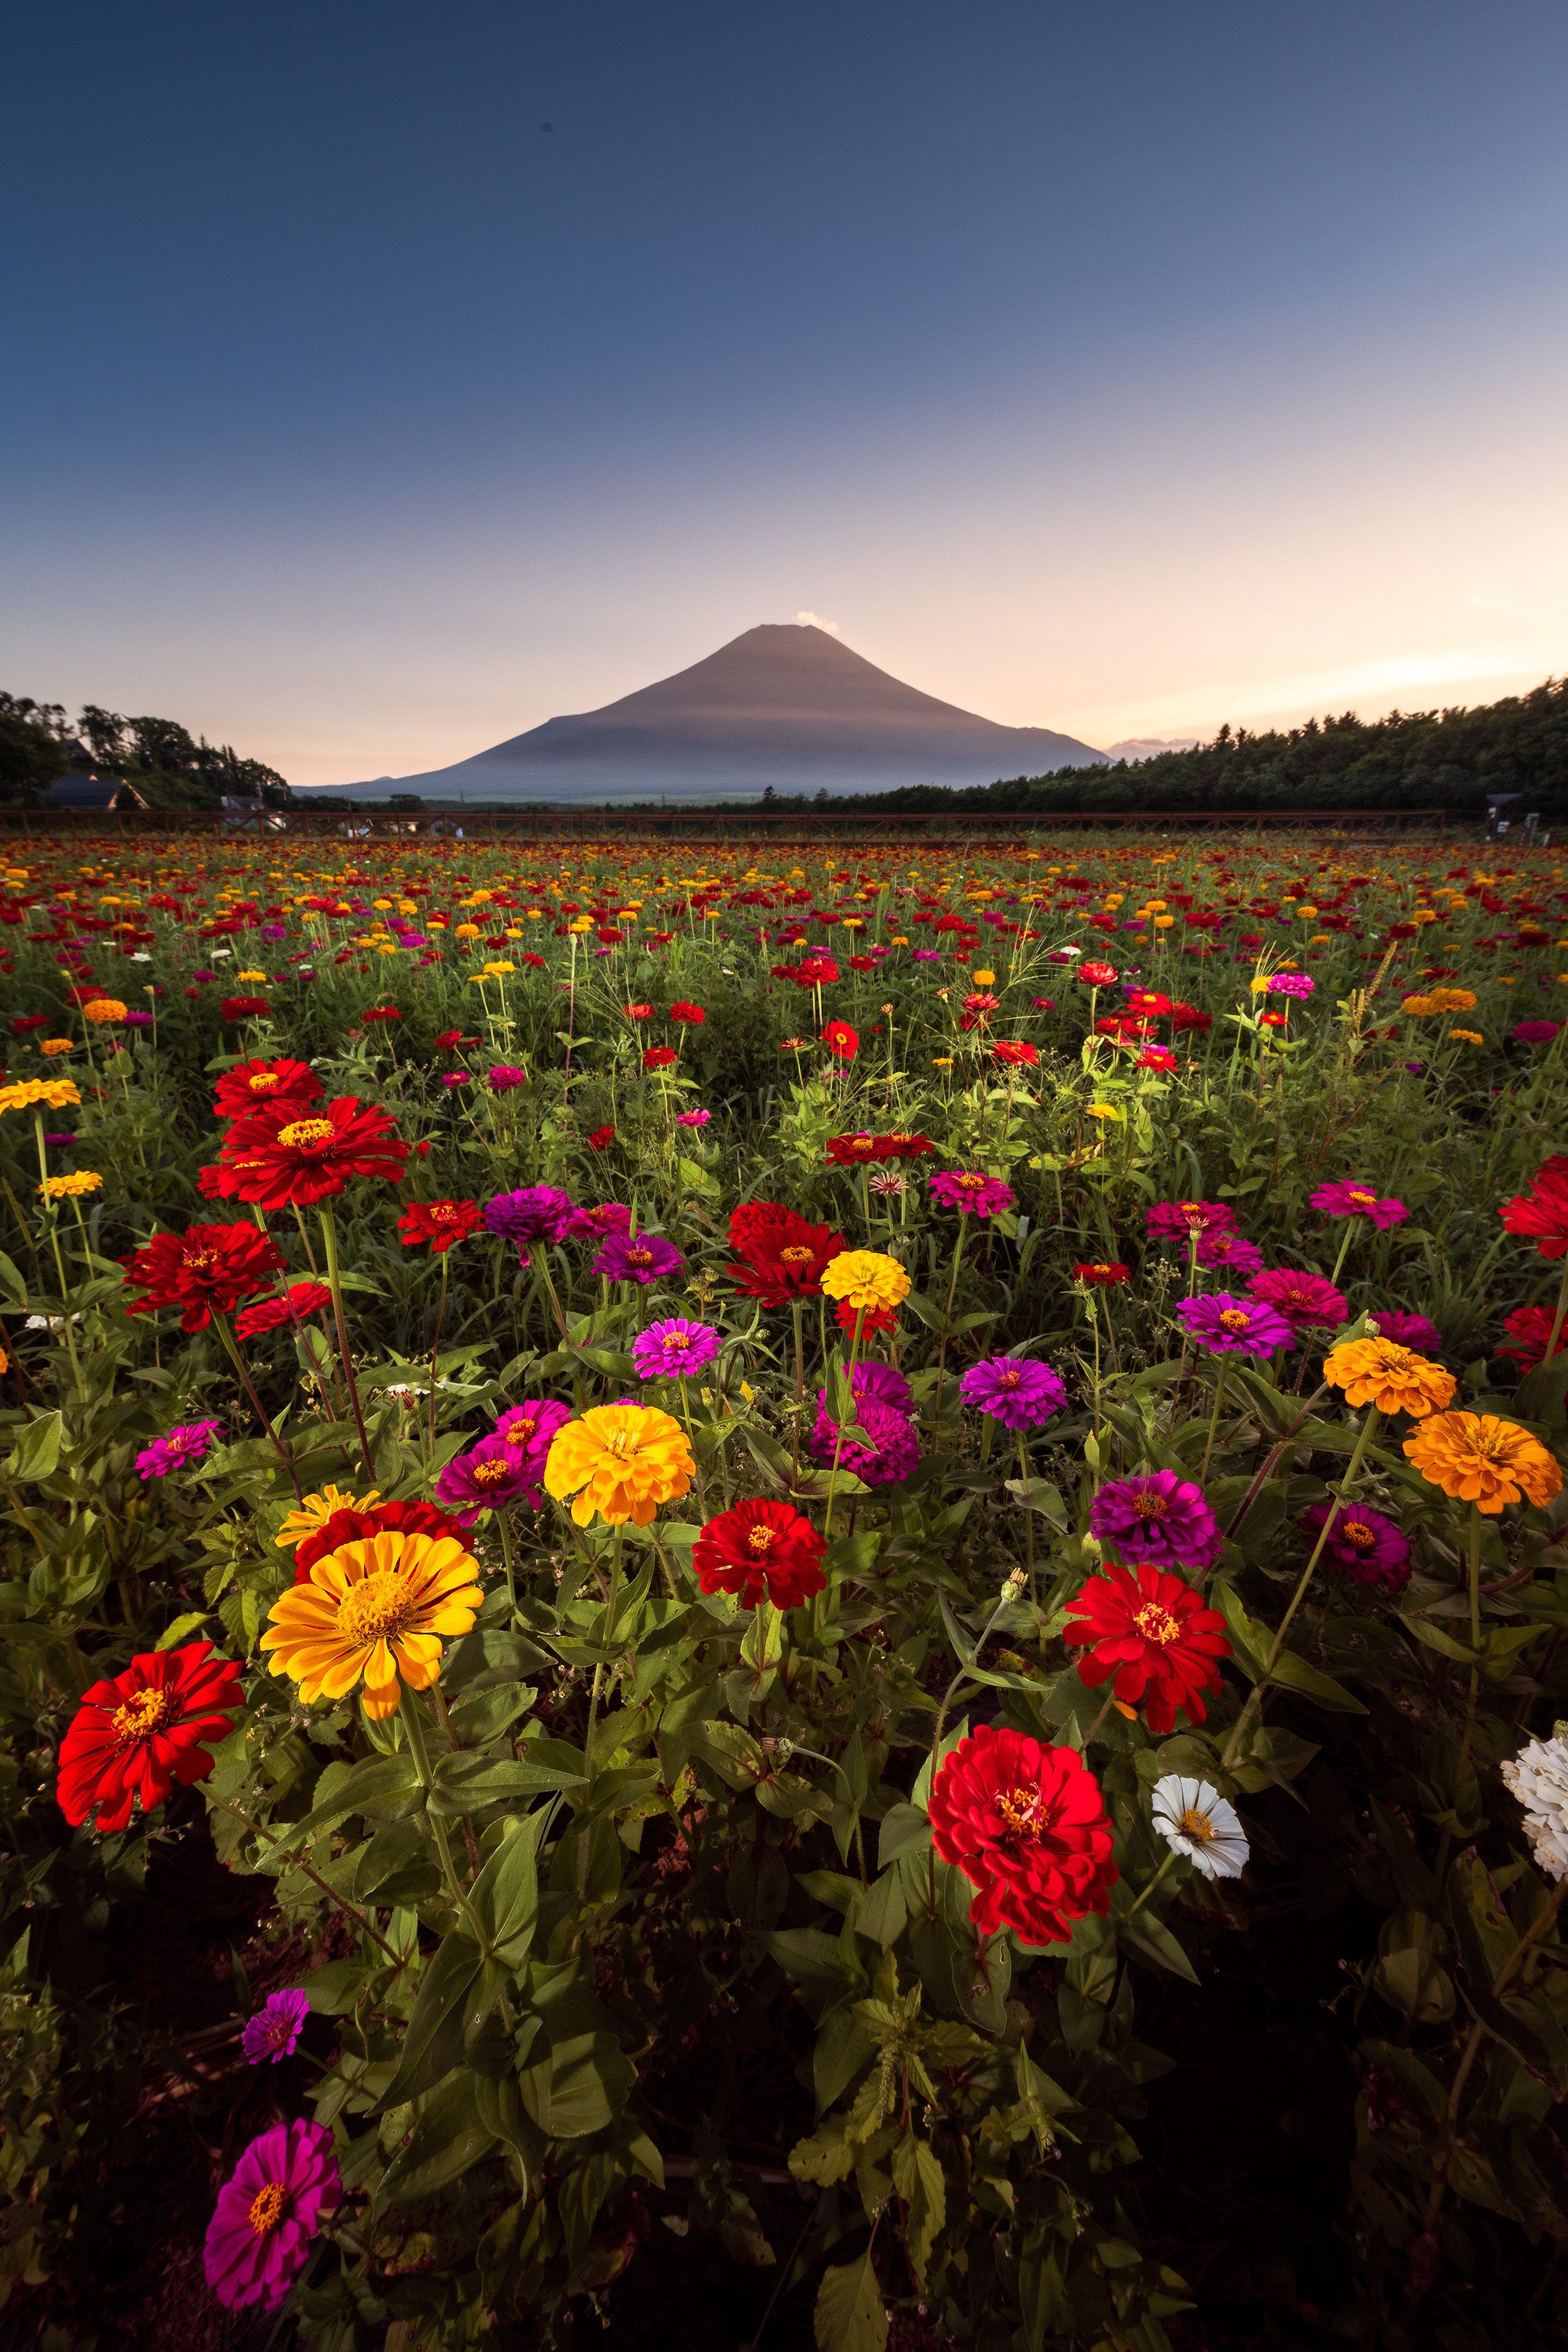 Mount Fuji おしゃれまとめの人気アイデア Pinterest Jana Haasova 2020 風景 山 写真 美しい景色